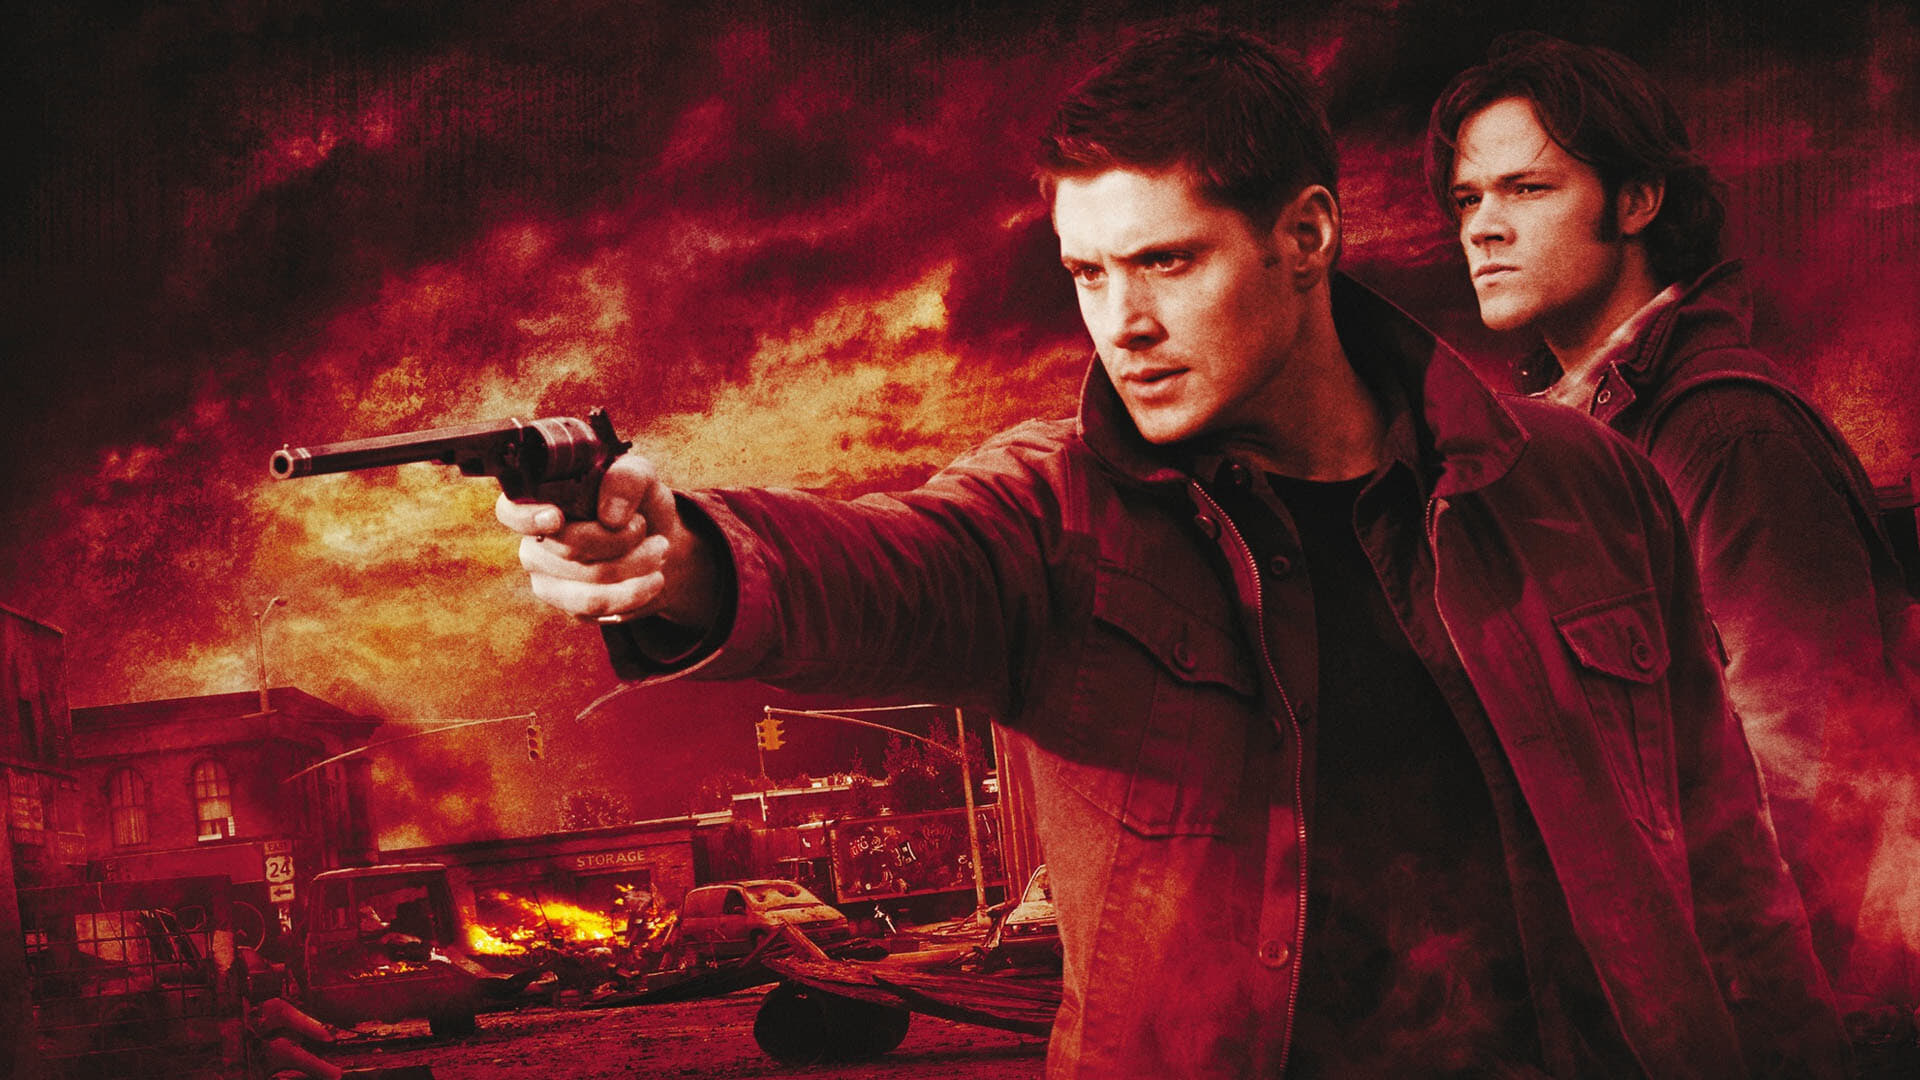 Supernatural - Season 12 Episode 17 The British Invasion